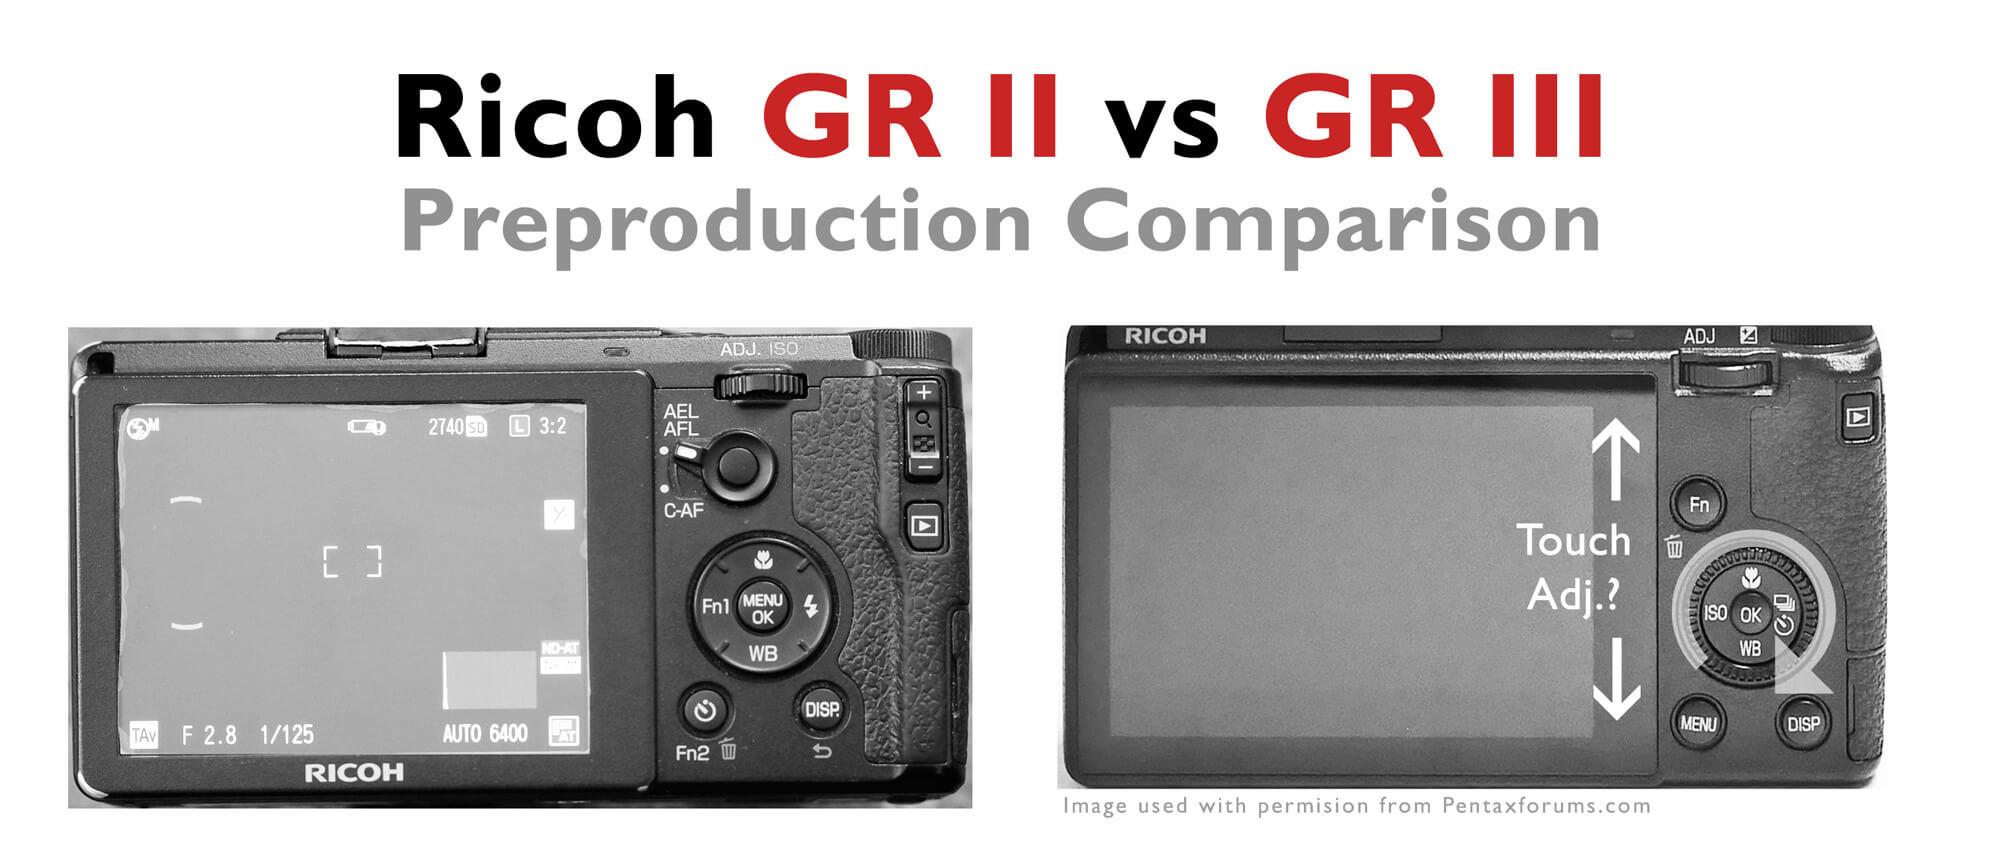 Ricoh GR II vs GR III Preproduction Comparison